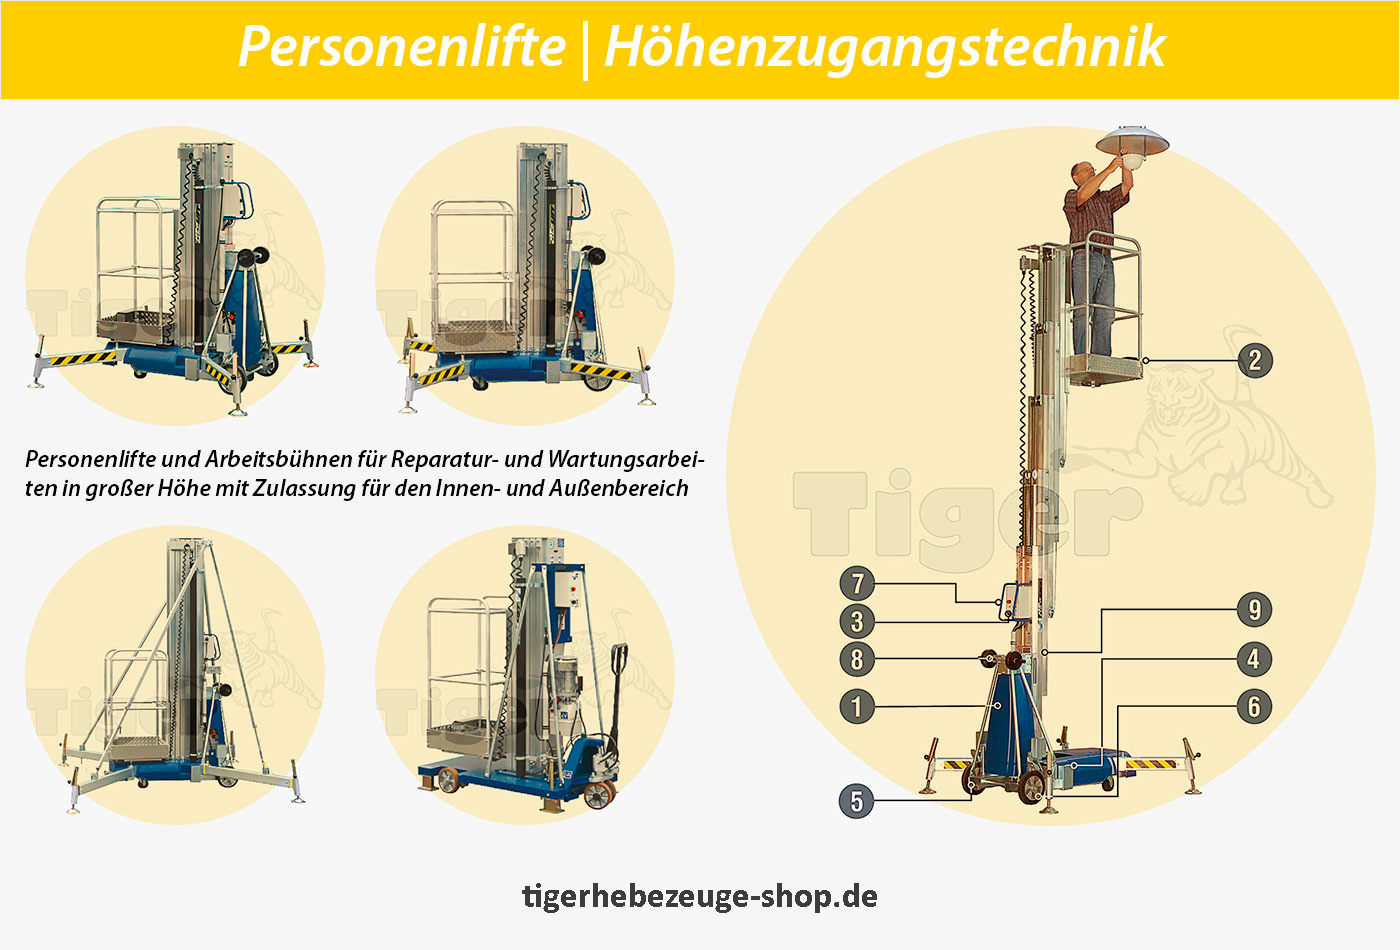 Personenlifte, Mobile Hubarbeitsbühne